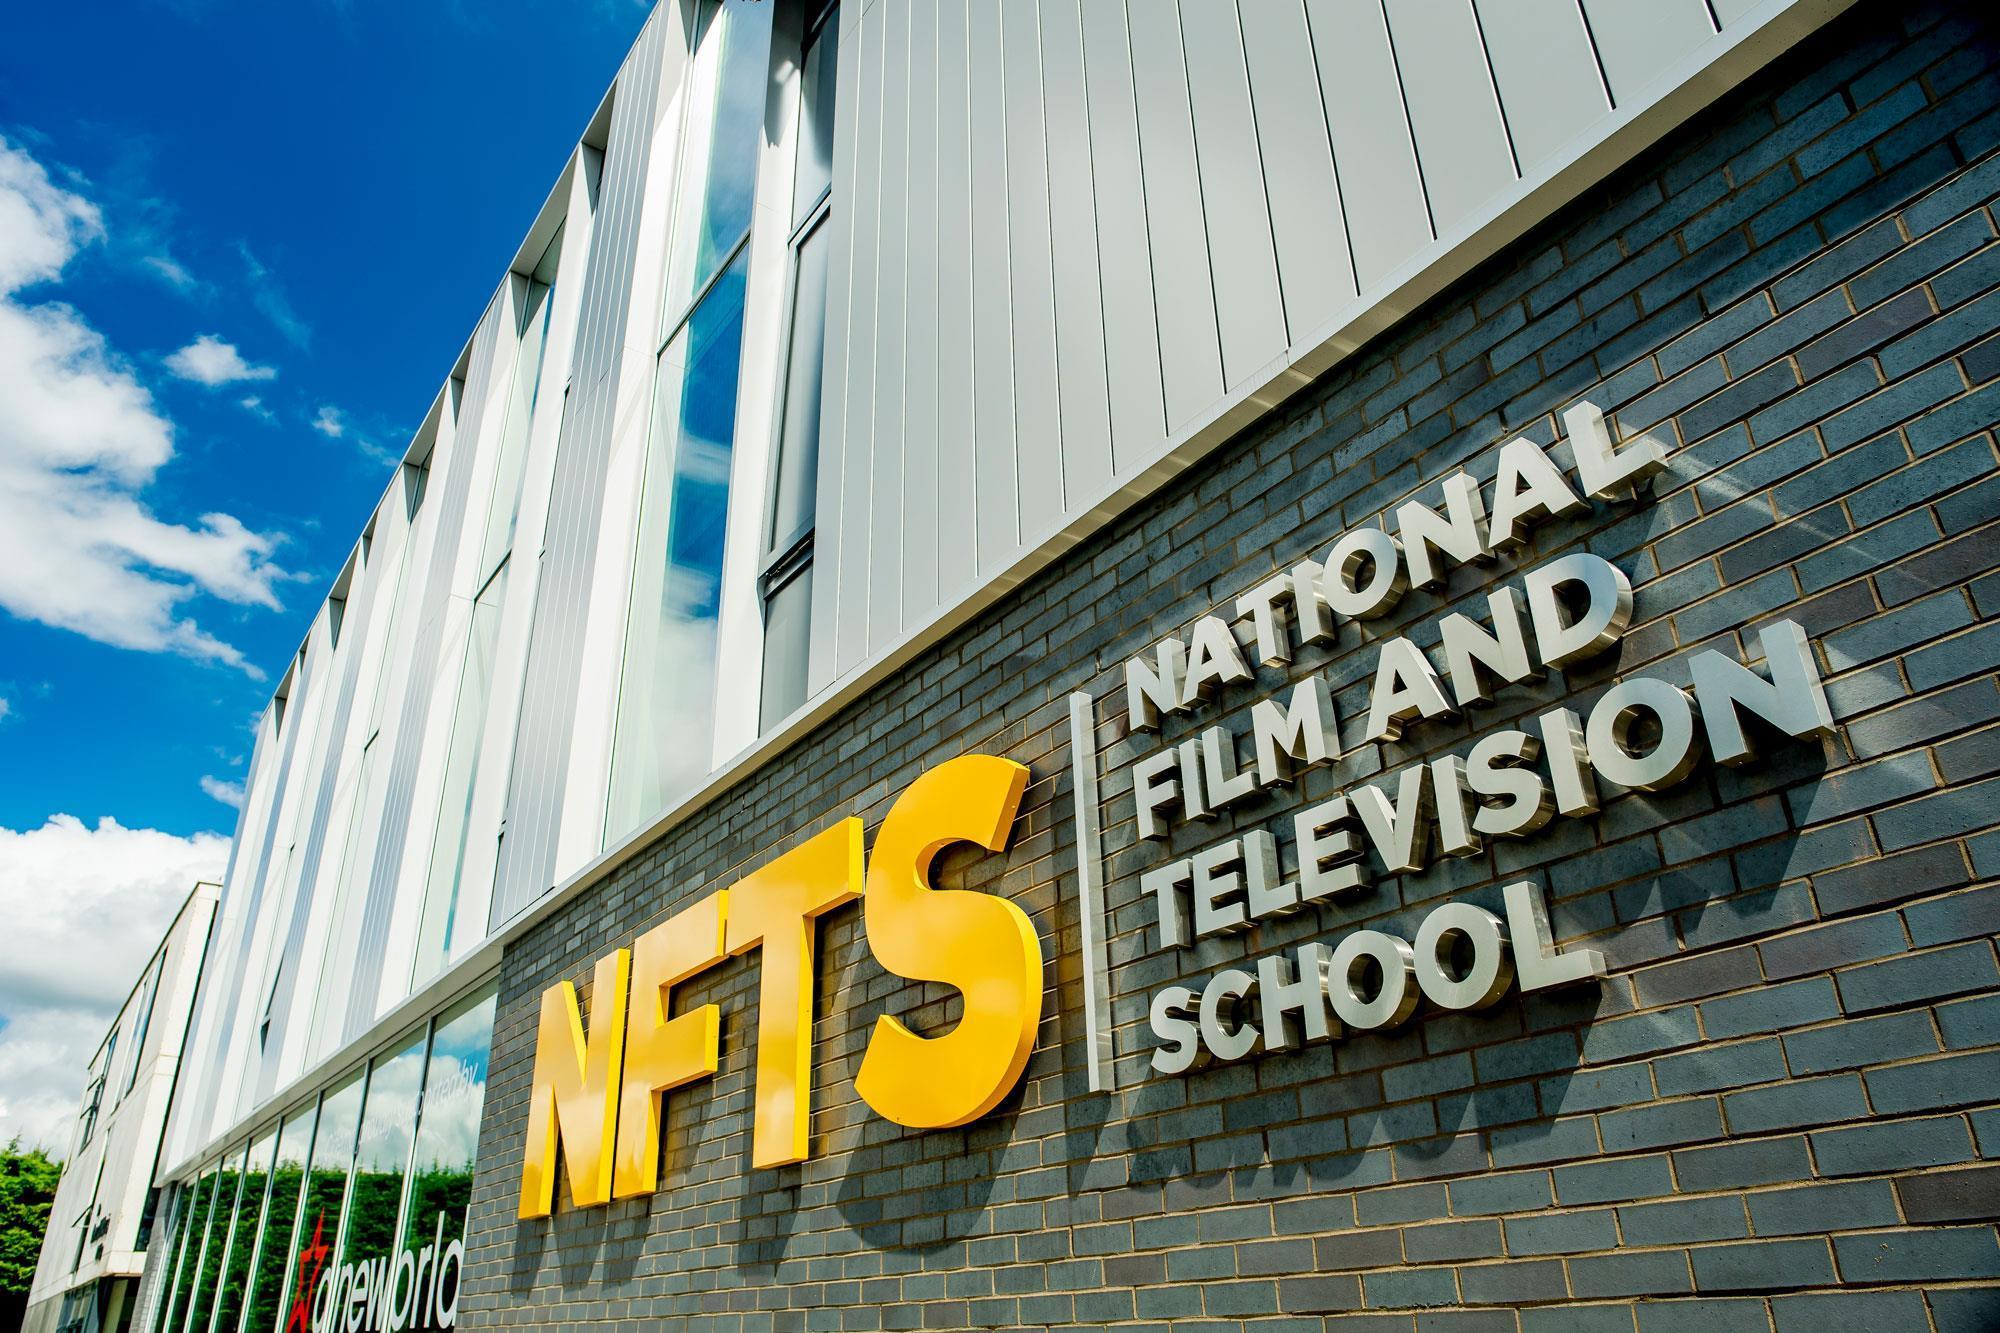 NFTS Film and TV Masterclass in Birmingham – February 29th